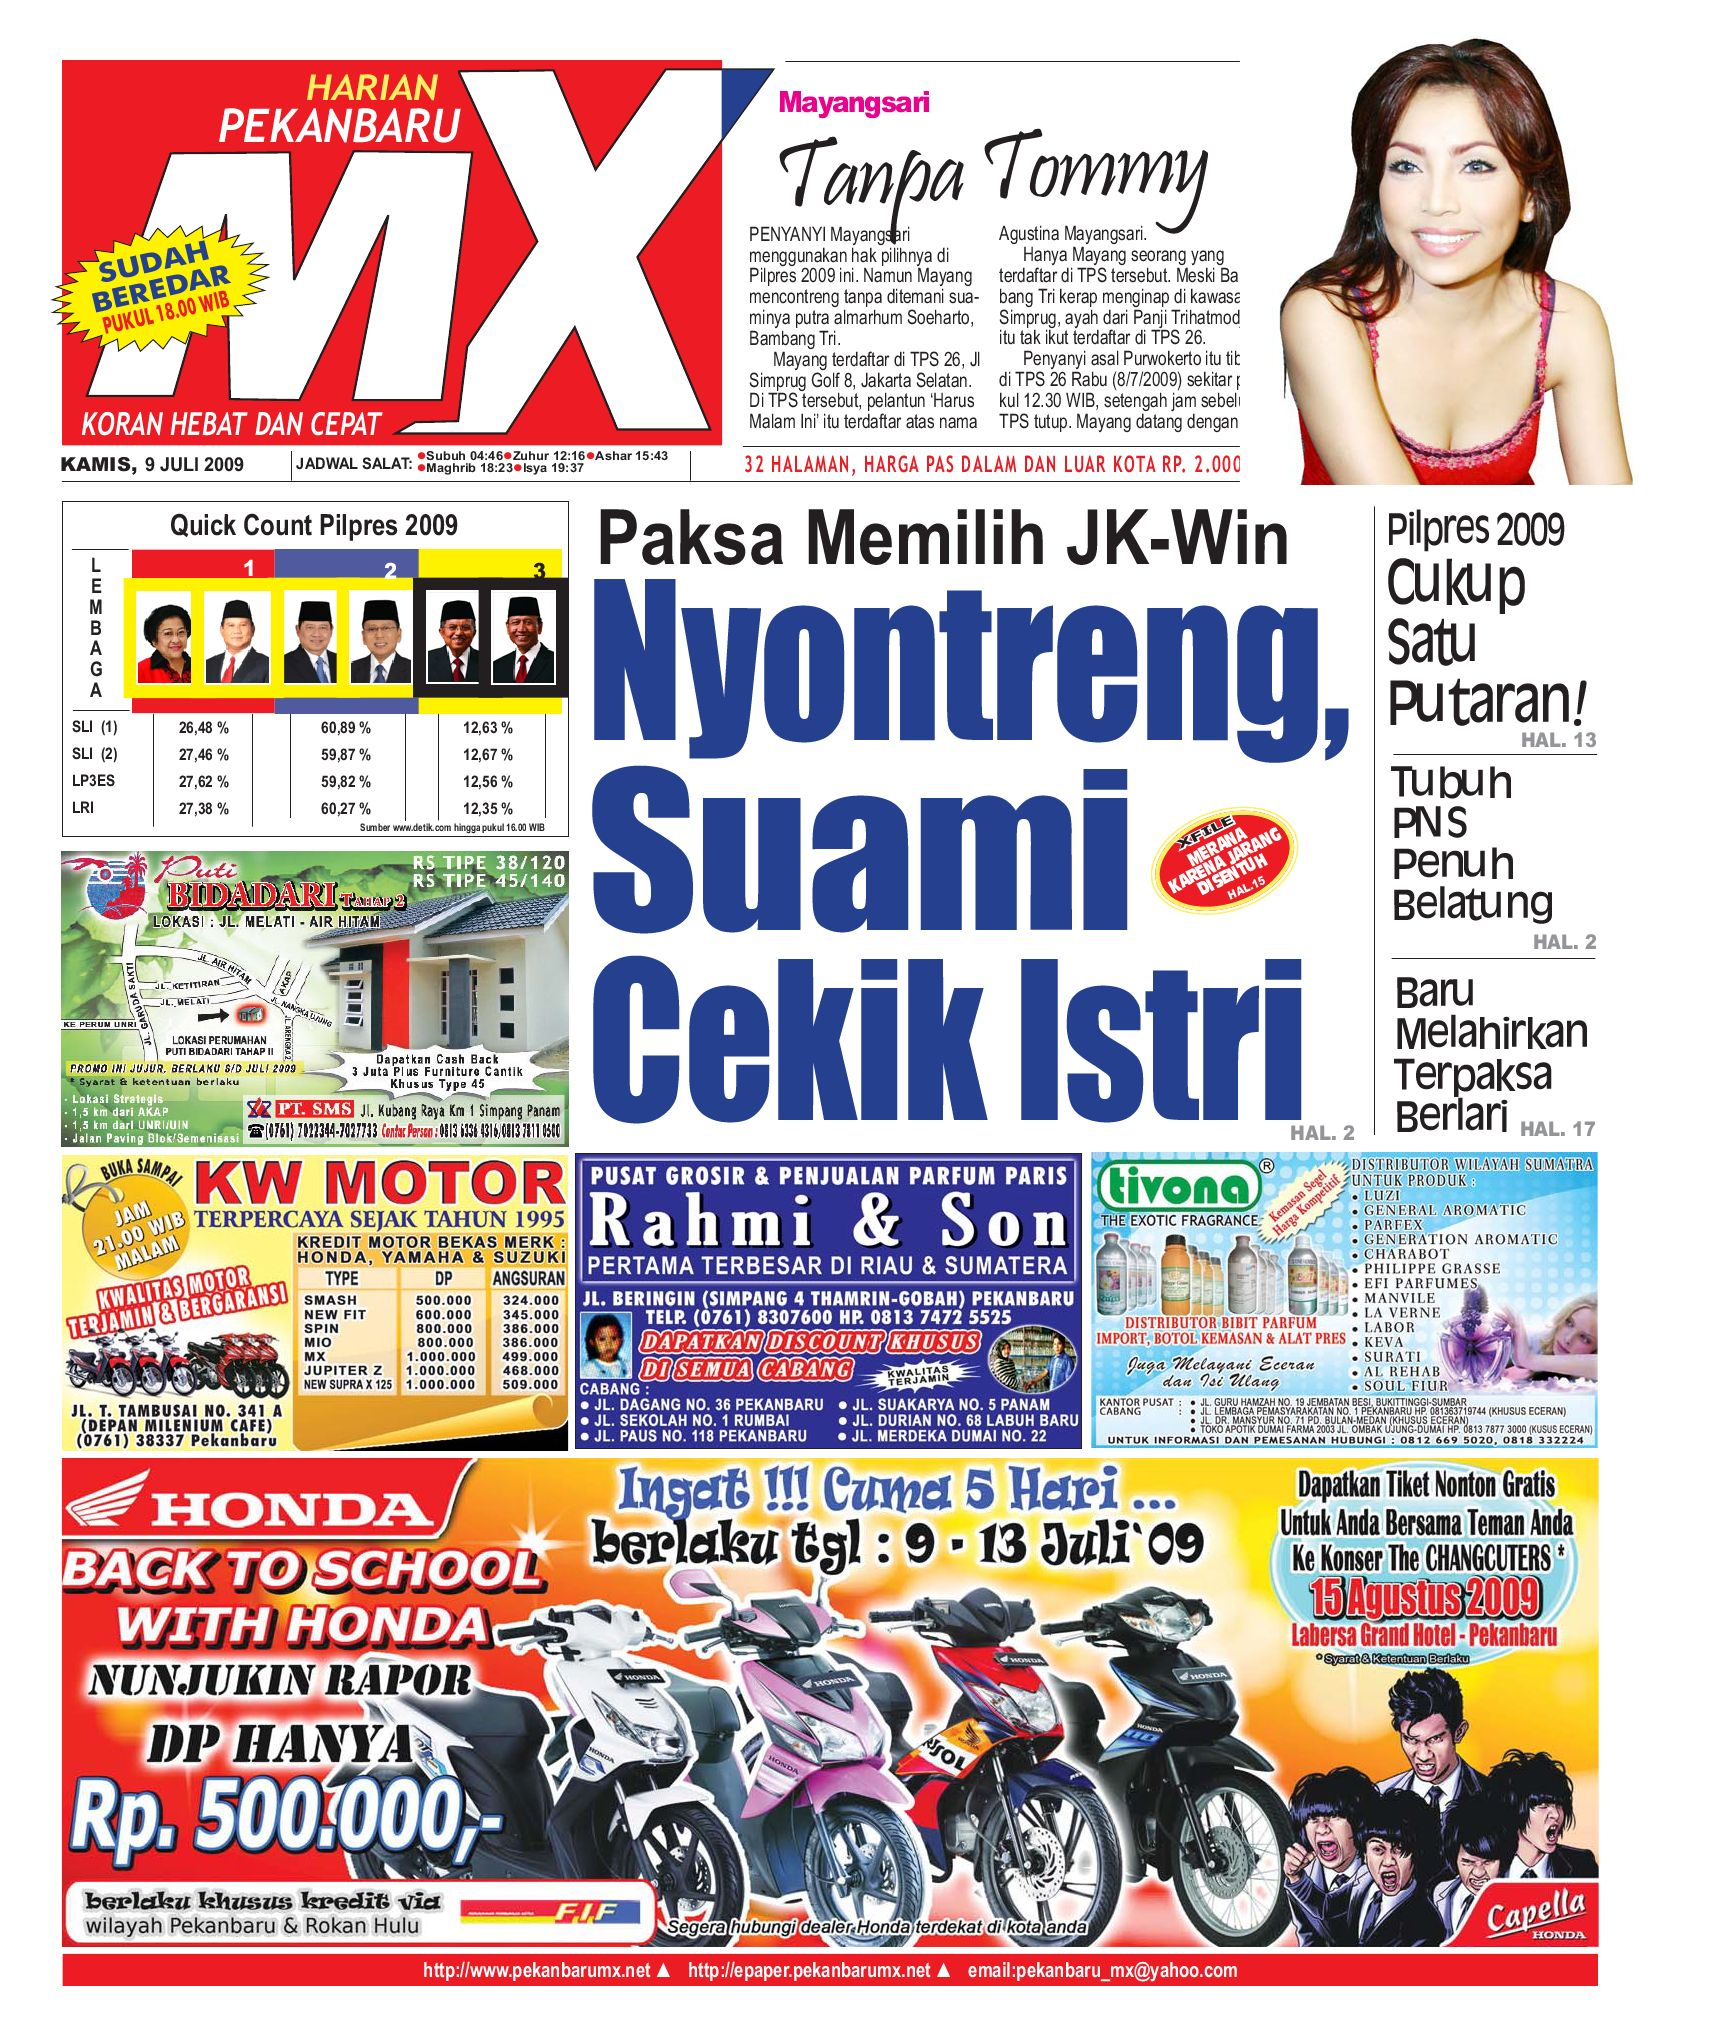 Pekanbarumxnet By Pekanbarumx Riau Issuu Jak Ban Plus Jakarta Bandung Idolanya Pria Perkasa